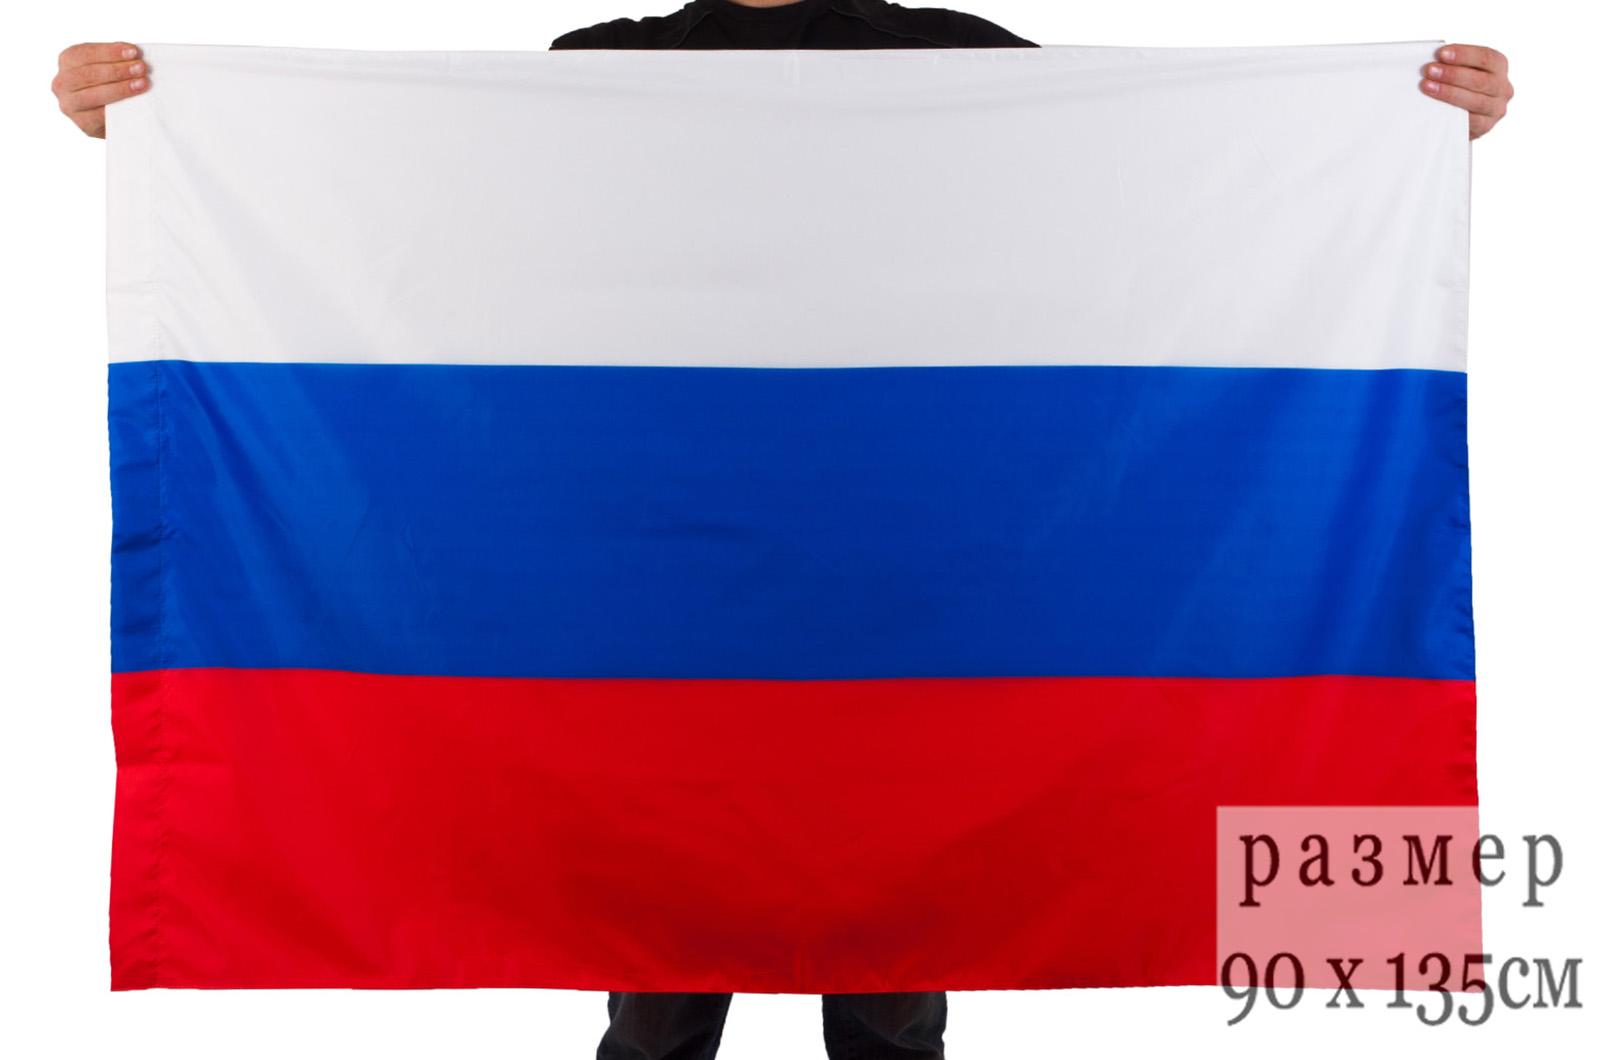 Купить флаг РФ